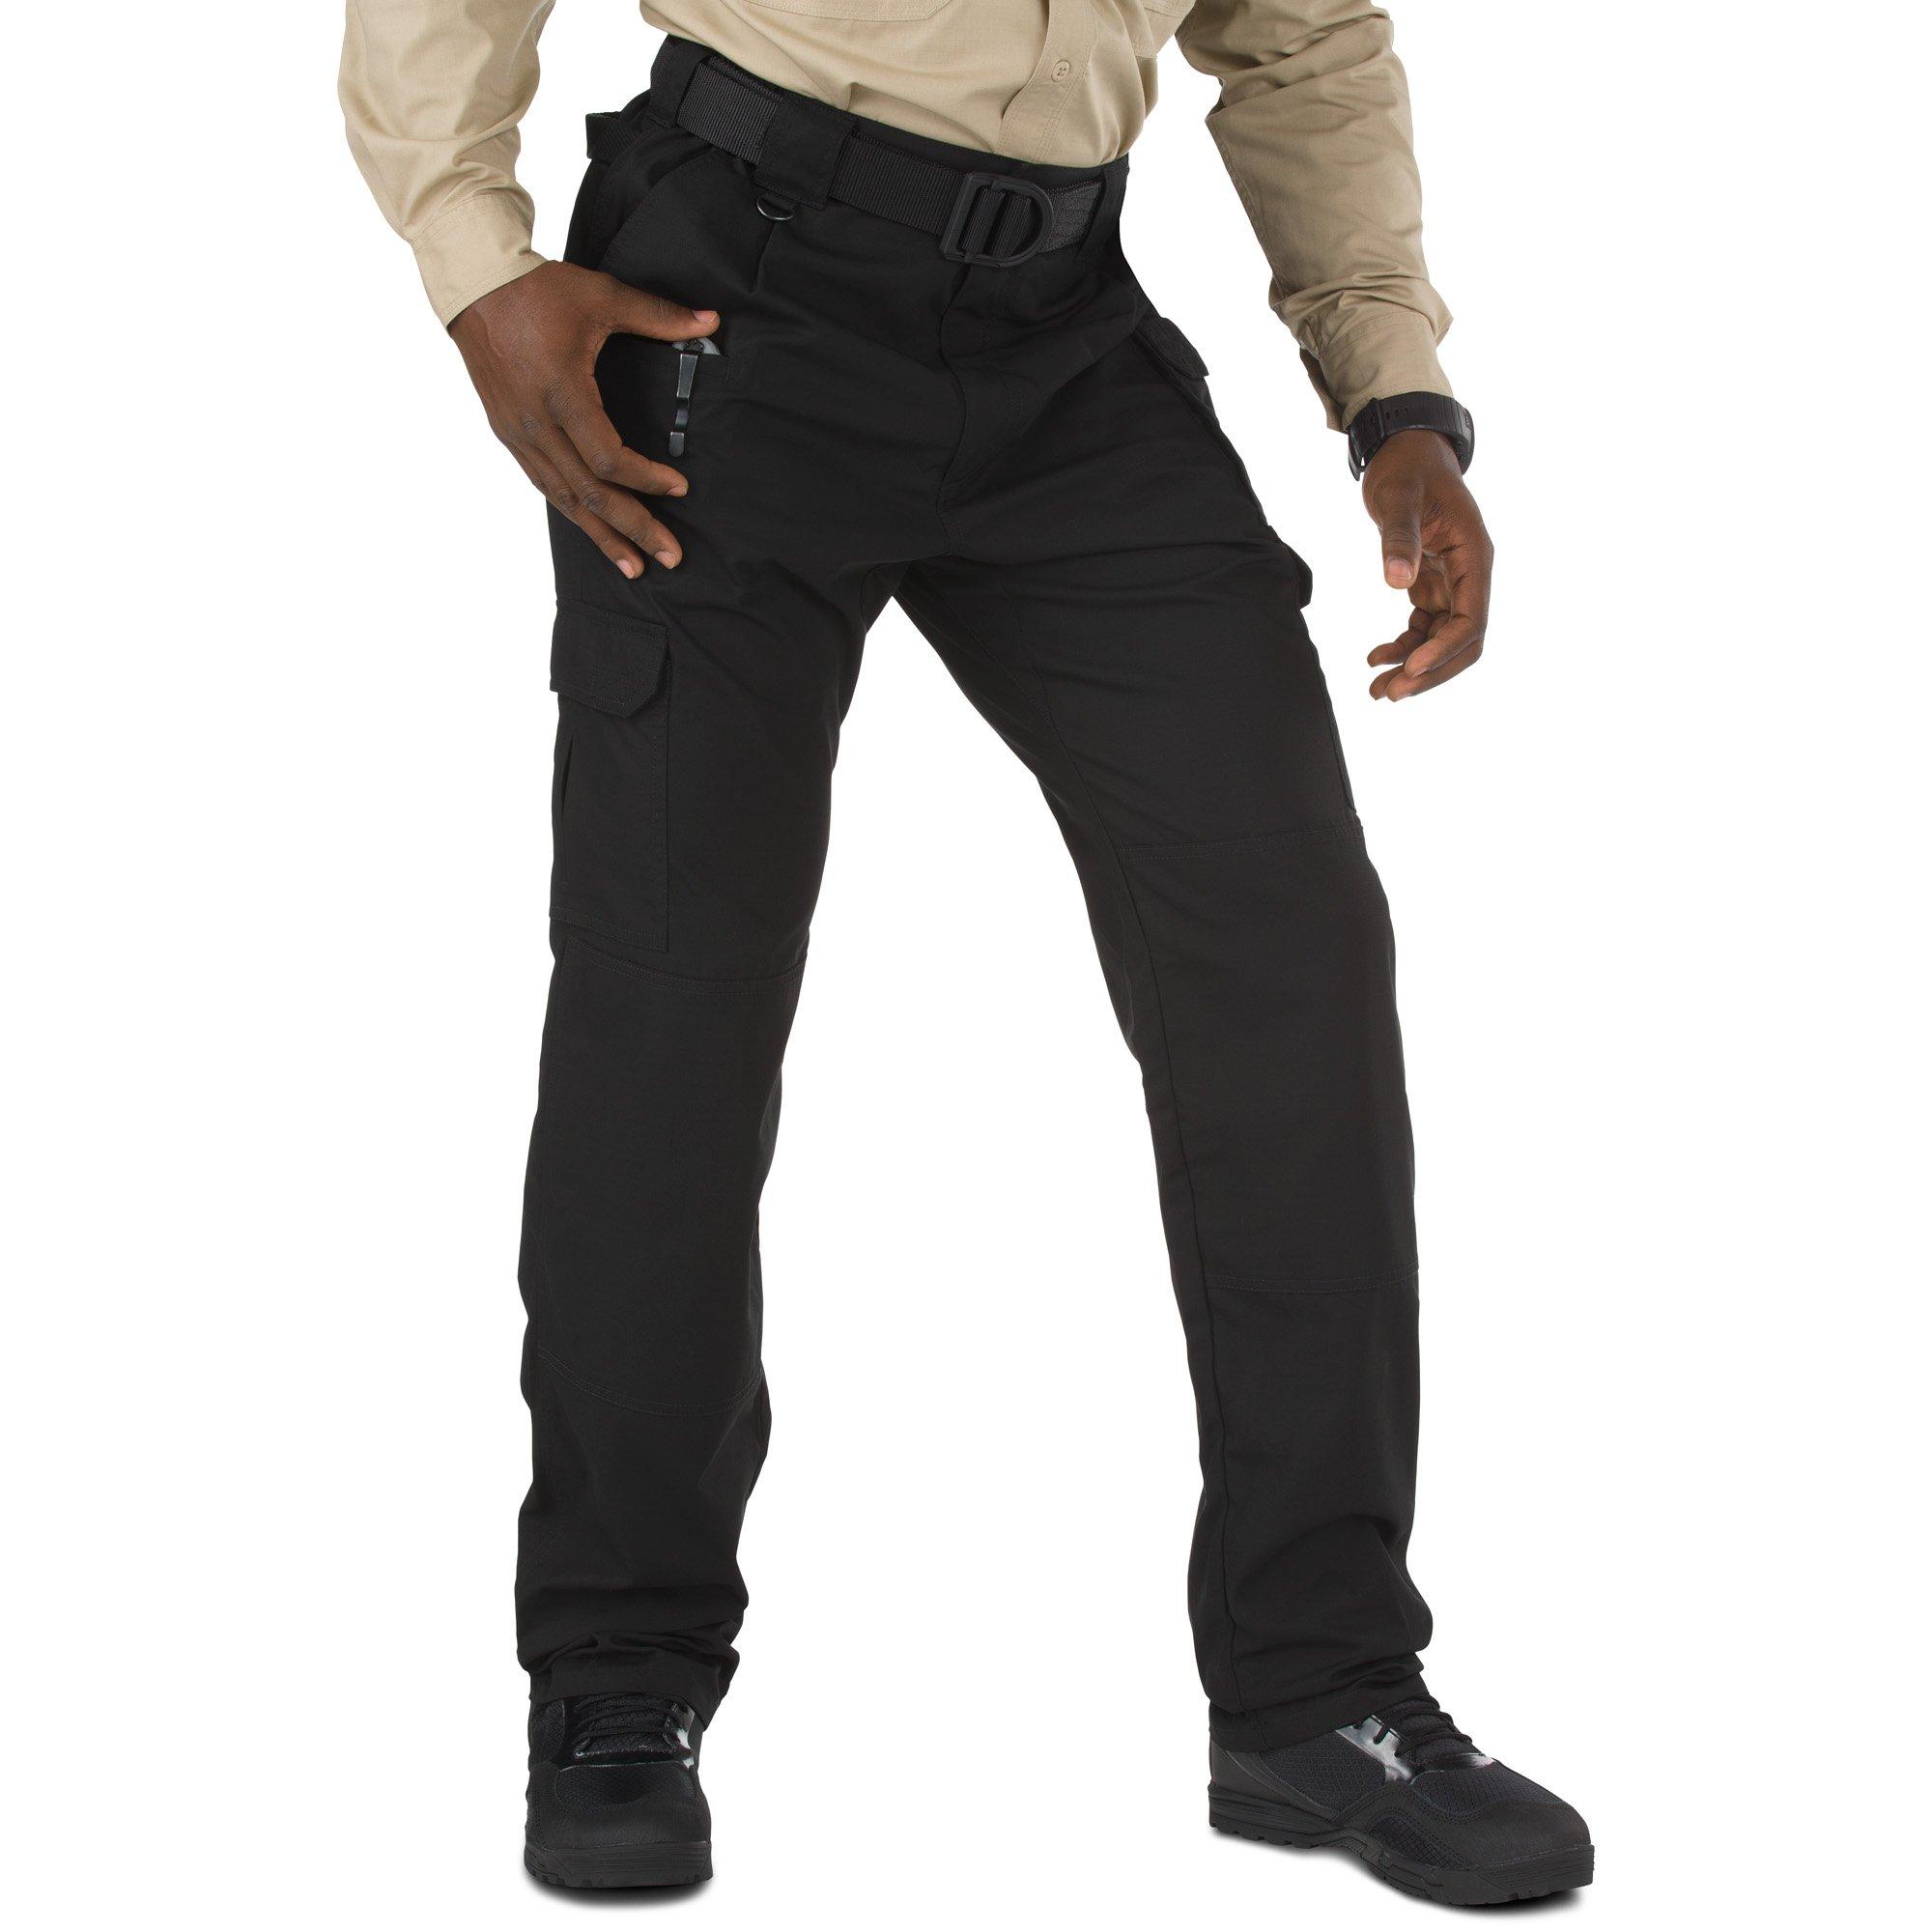 5.11 Men's Taclite Pro Tactical Pants, Style 74273, Black, 50W Unhemmed by 5.11